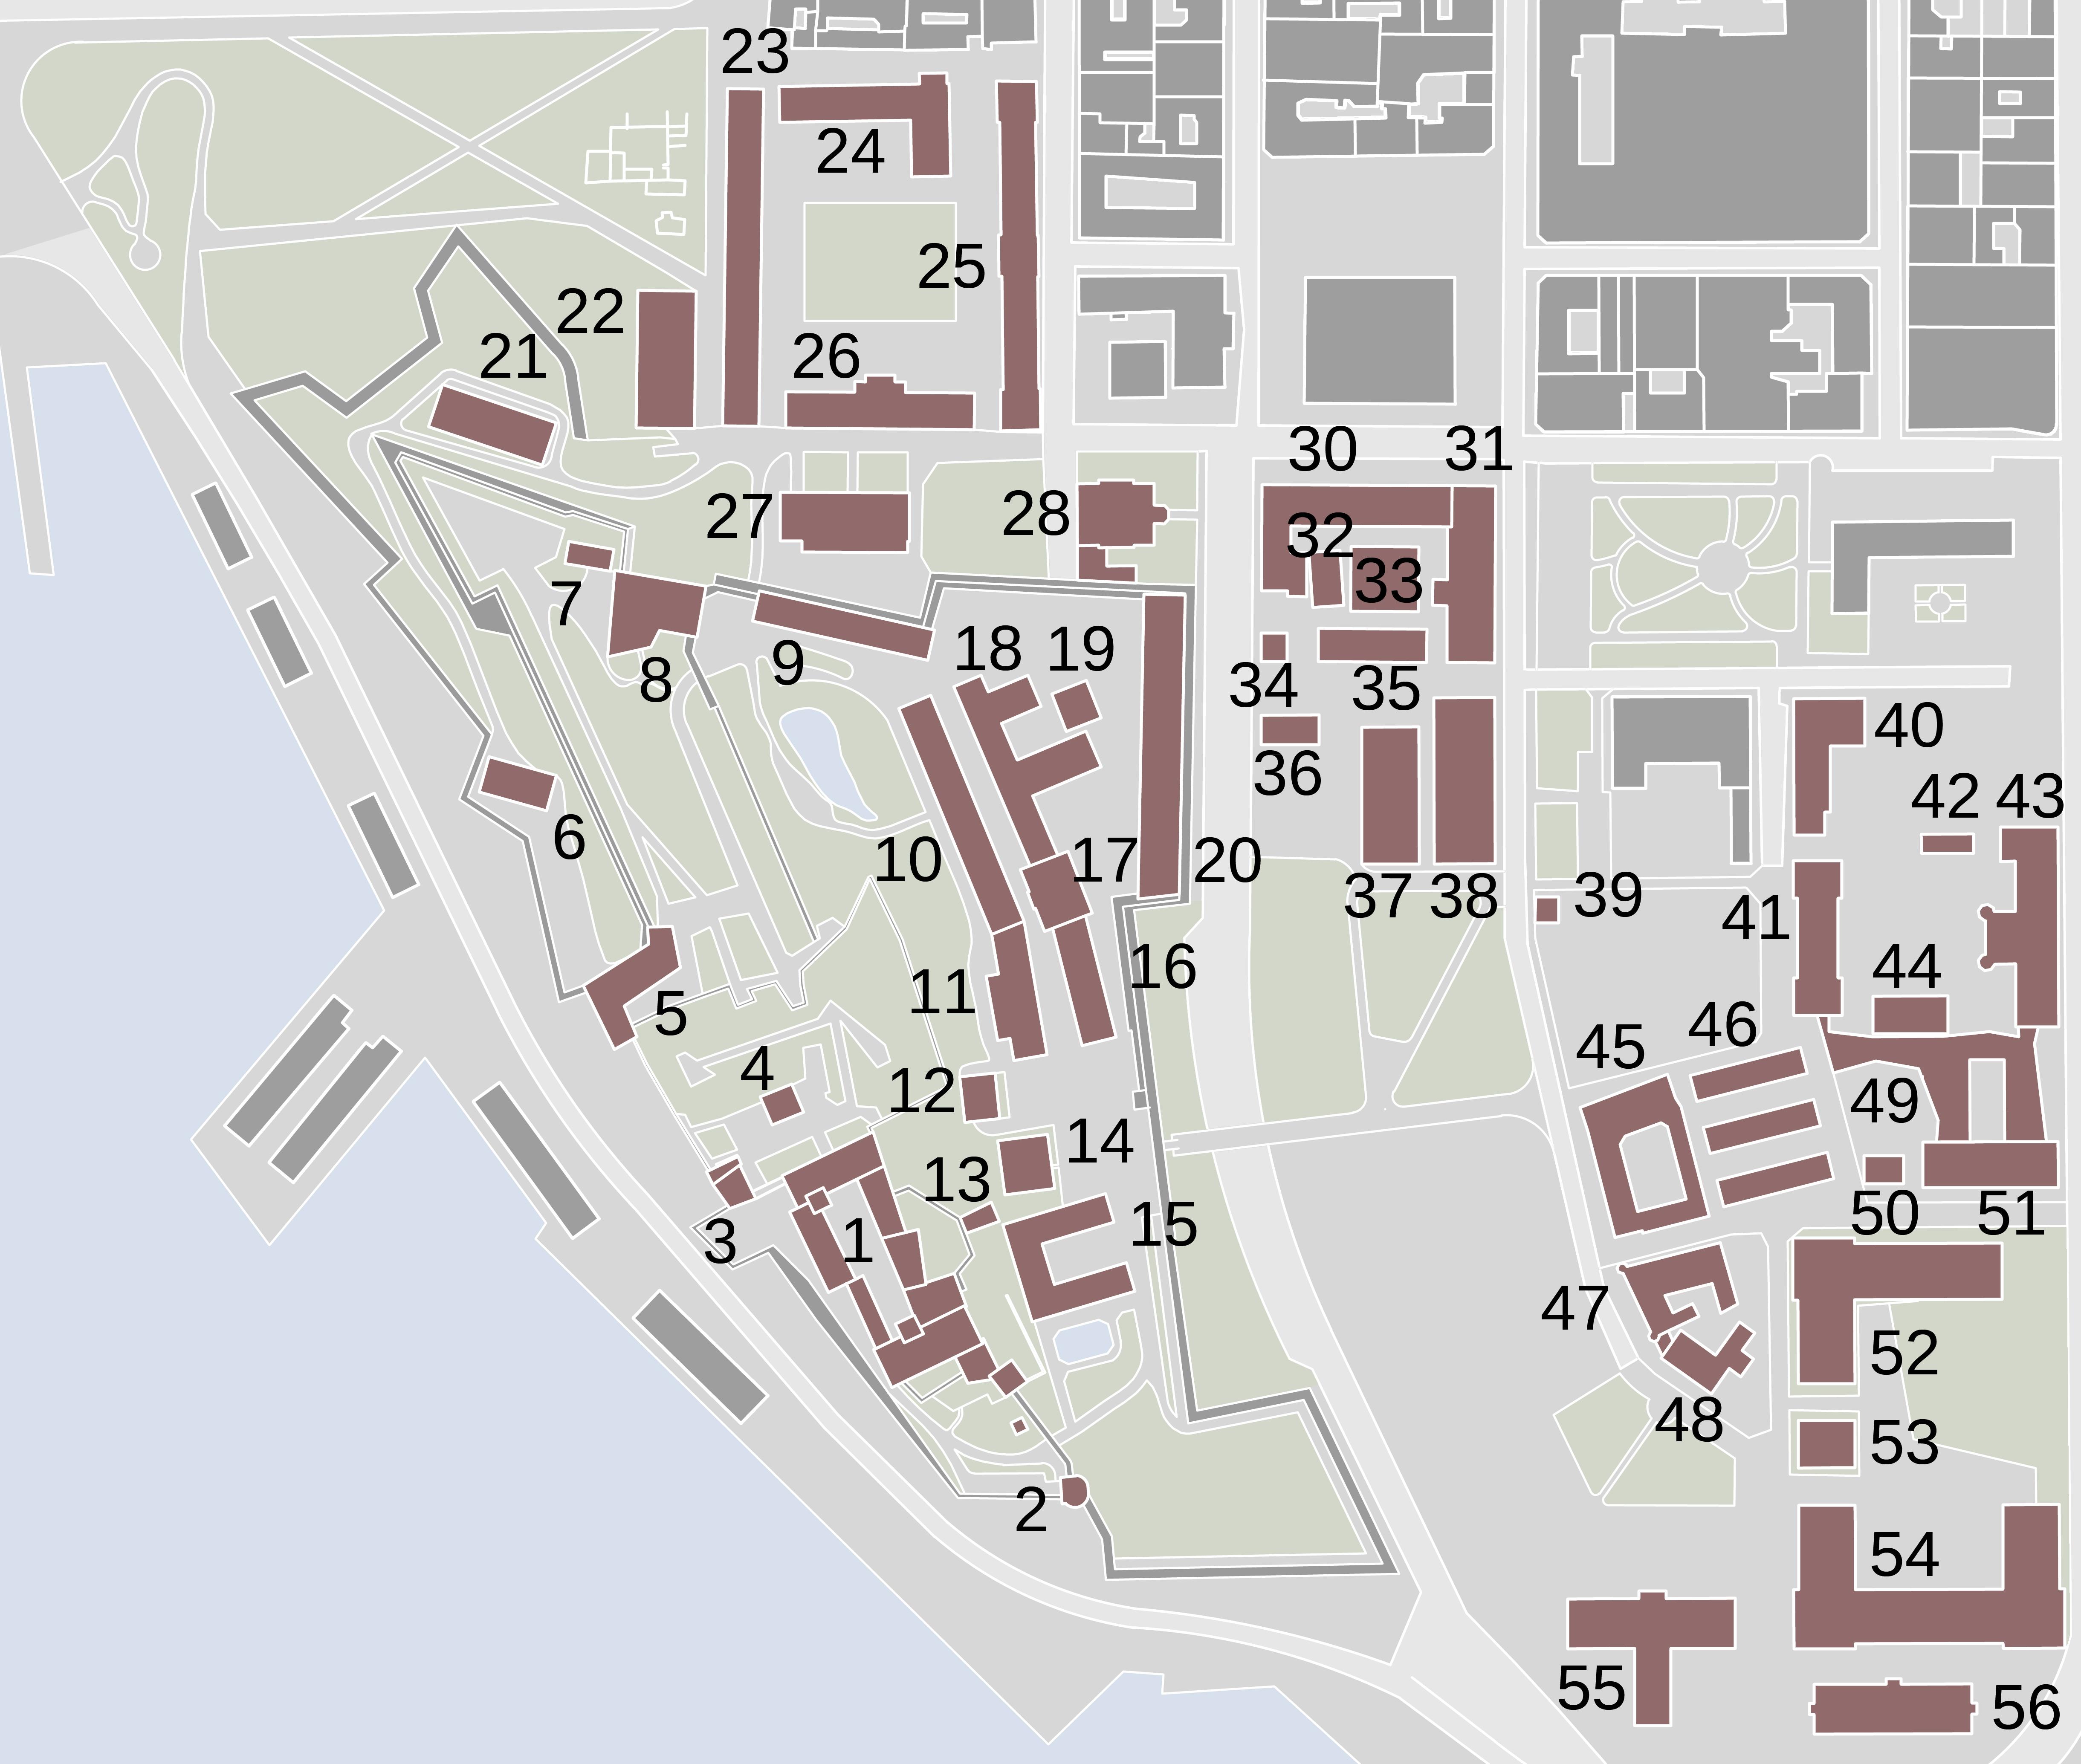 ridehuset akershus festning kart File:Akershus fortress map   buildings.   Wikimedia Commons ridehuset akershus festning kart